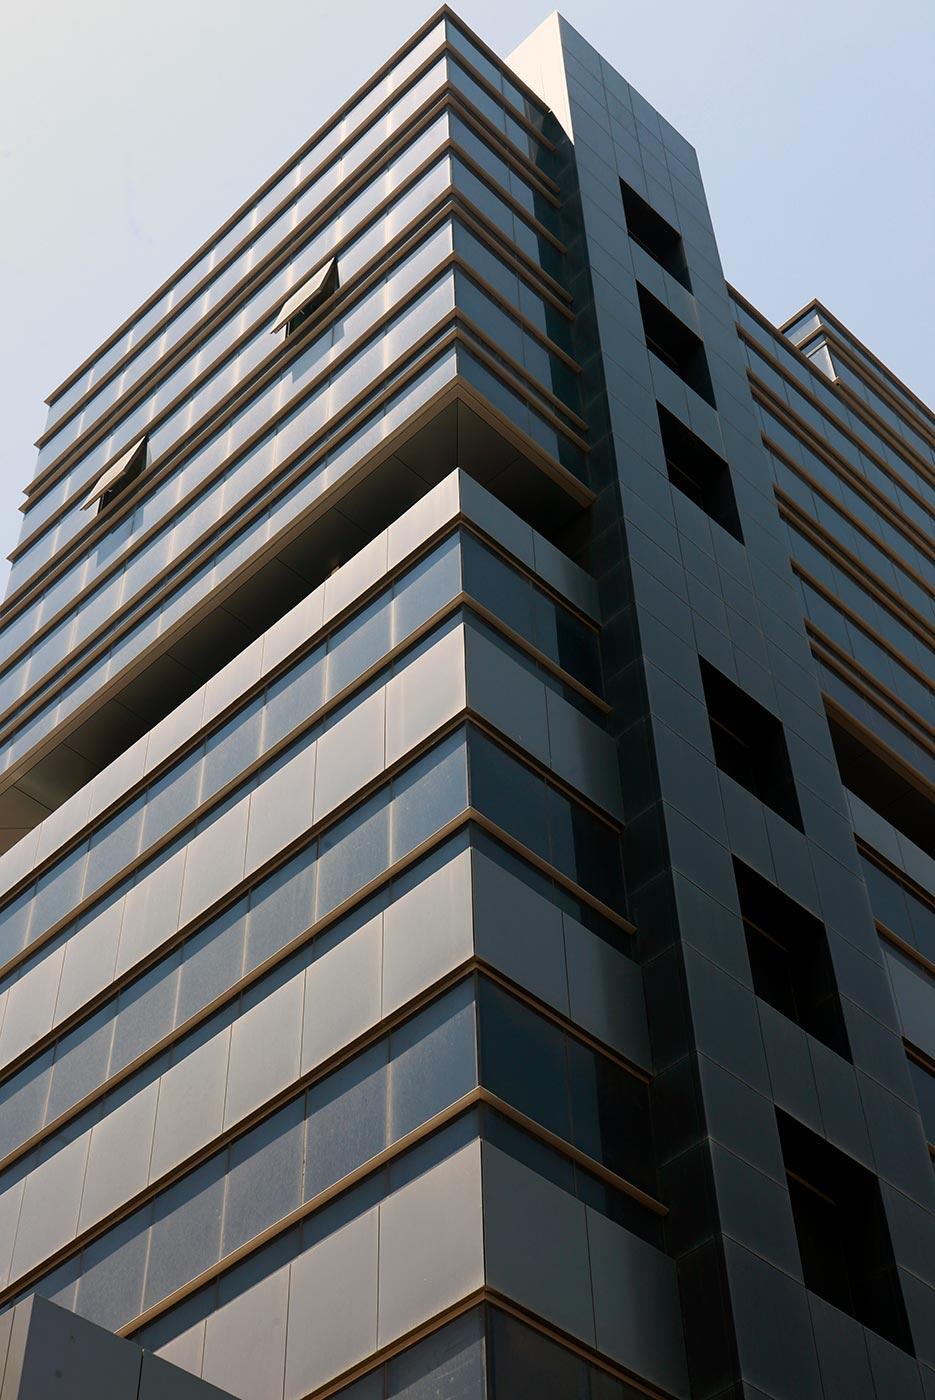 Oficinas-Dbayeh.-Beirut-Lebanon.-larson-Alunatural-Titanium-Brushed-1_1593095290.jpg